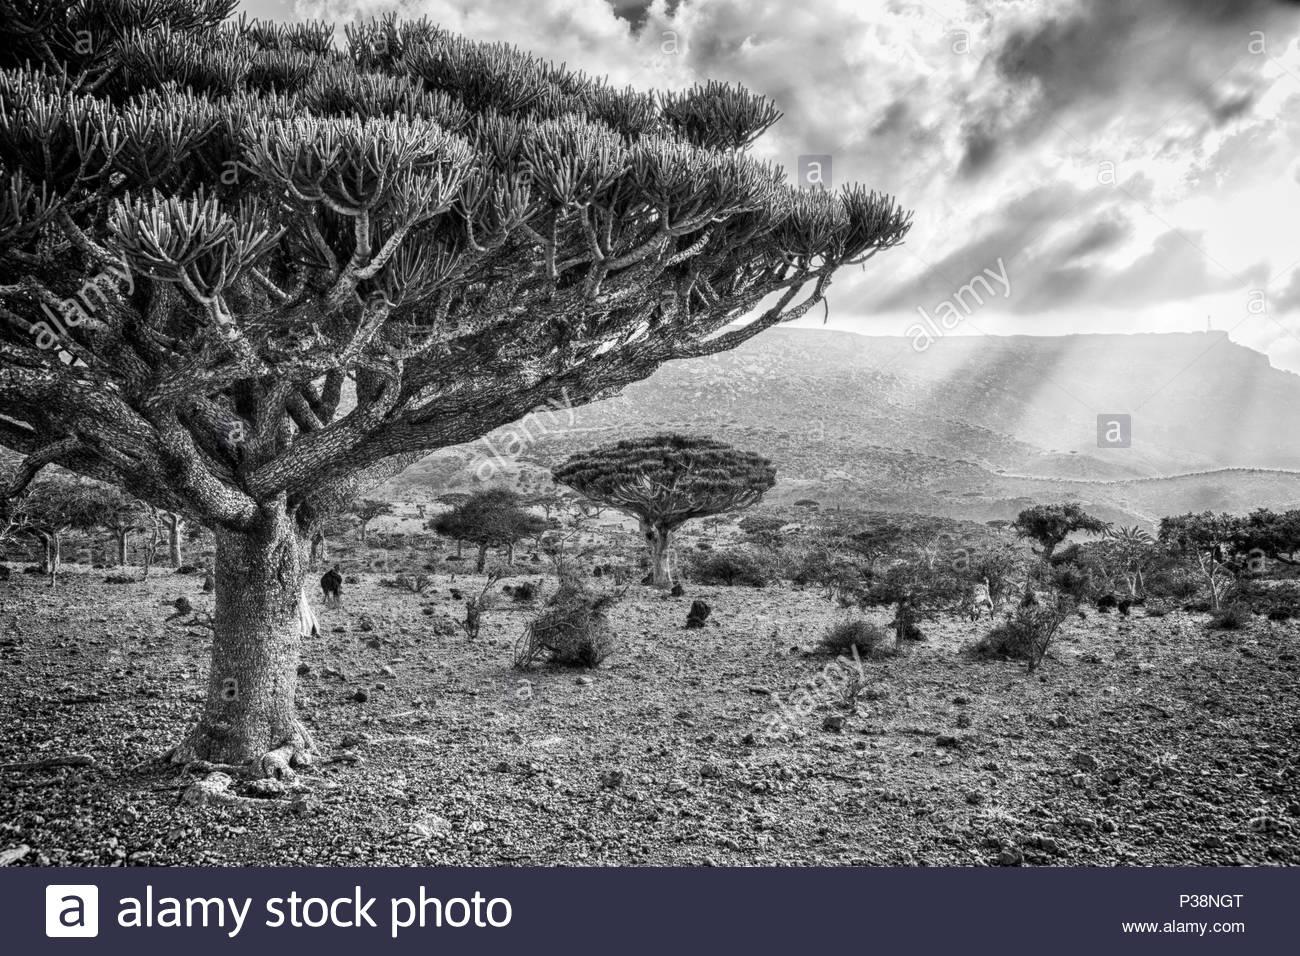 Dracaena Cinnabari - Dragon's Blood Tree - Stock Image